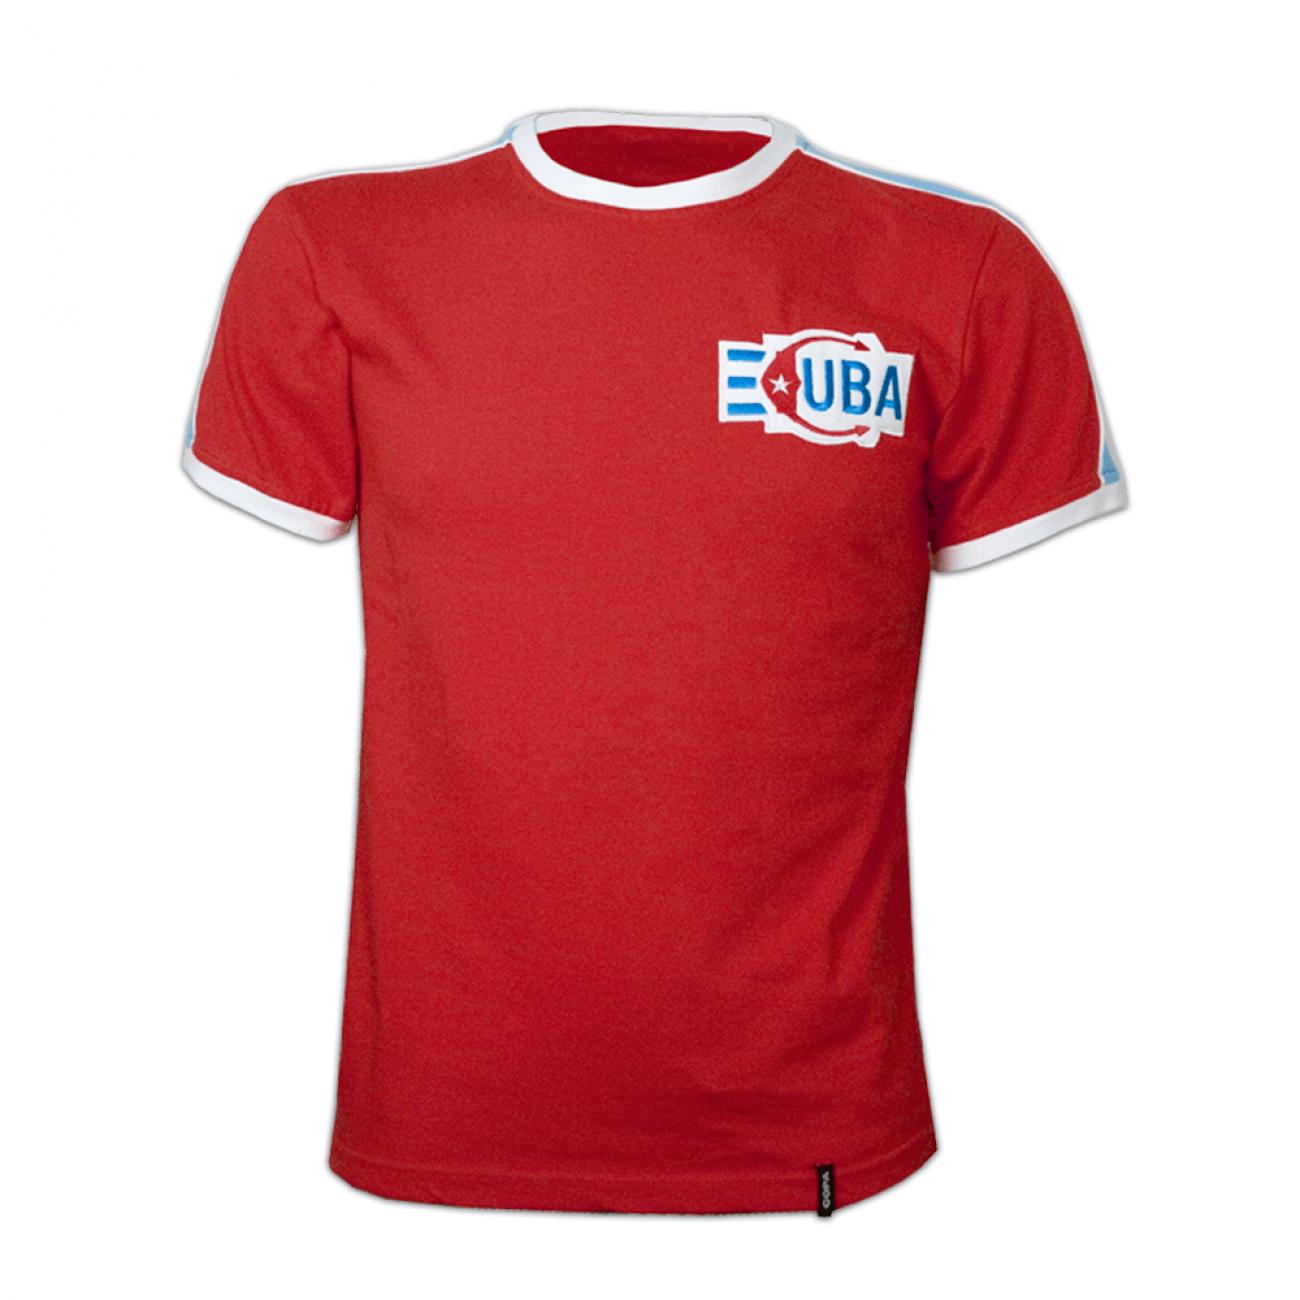 549b555fb75 Camiseta retro Cuba años 80. Fidel Castro | Retrofootball®